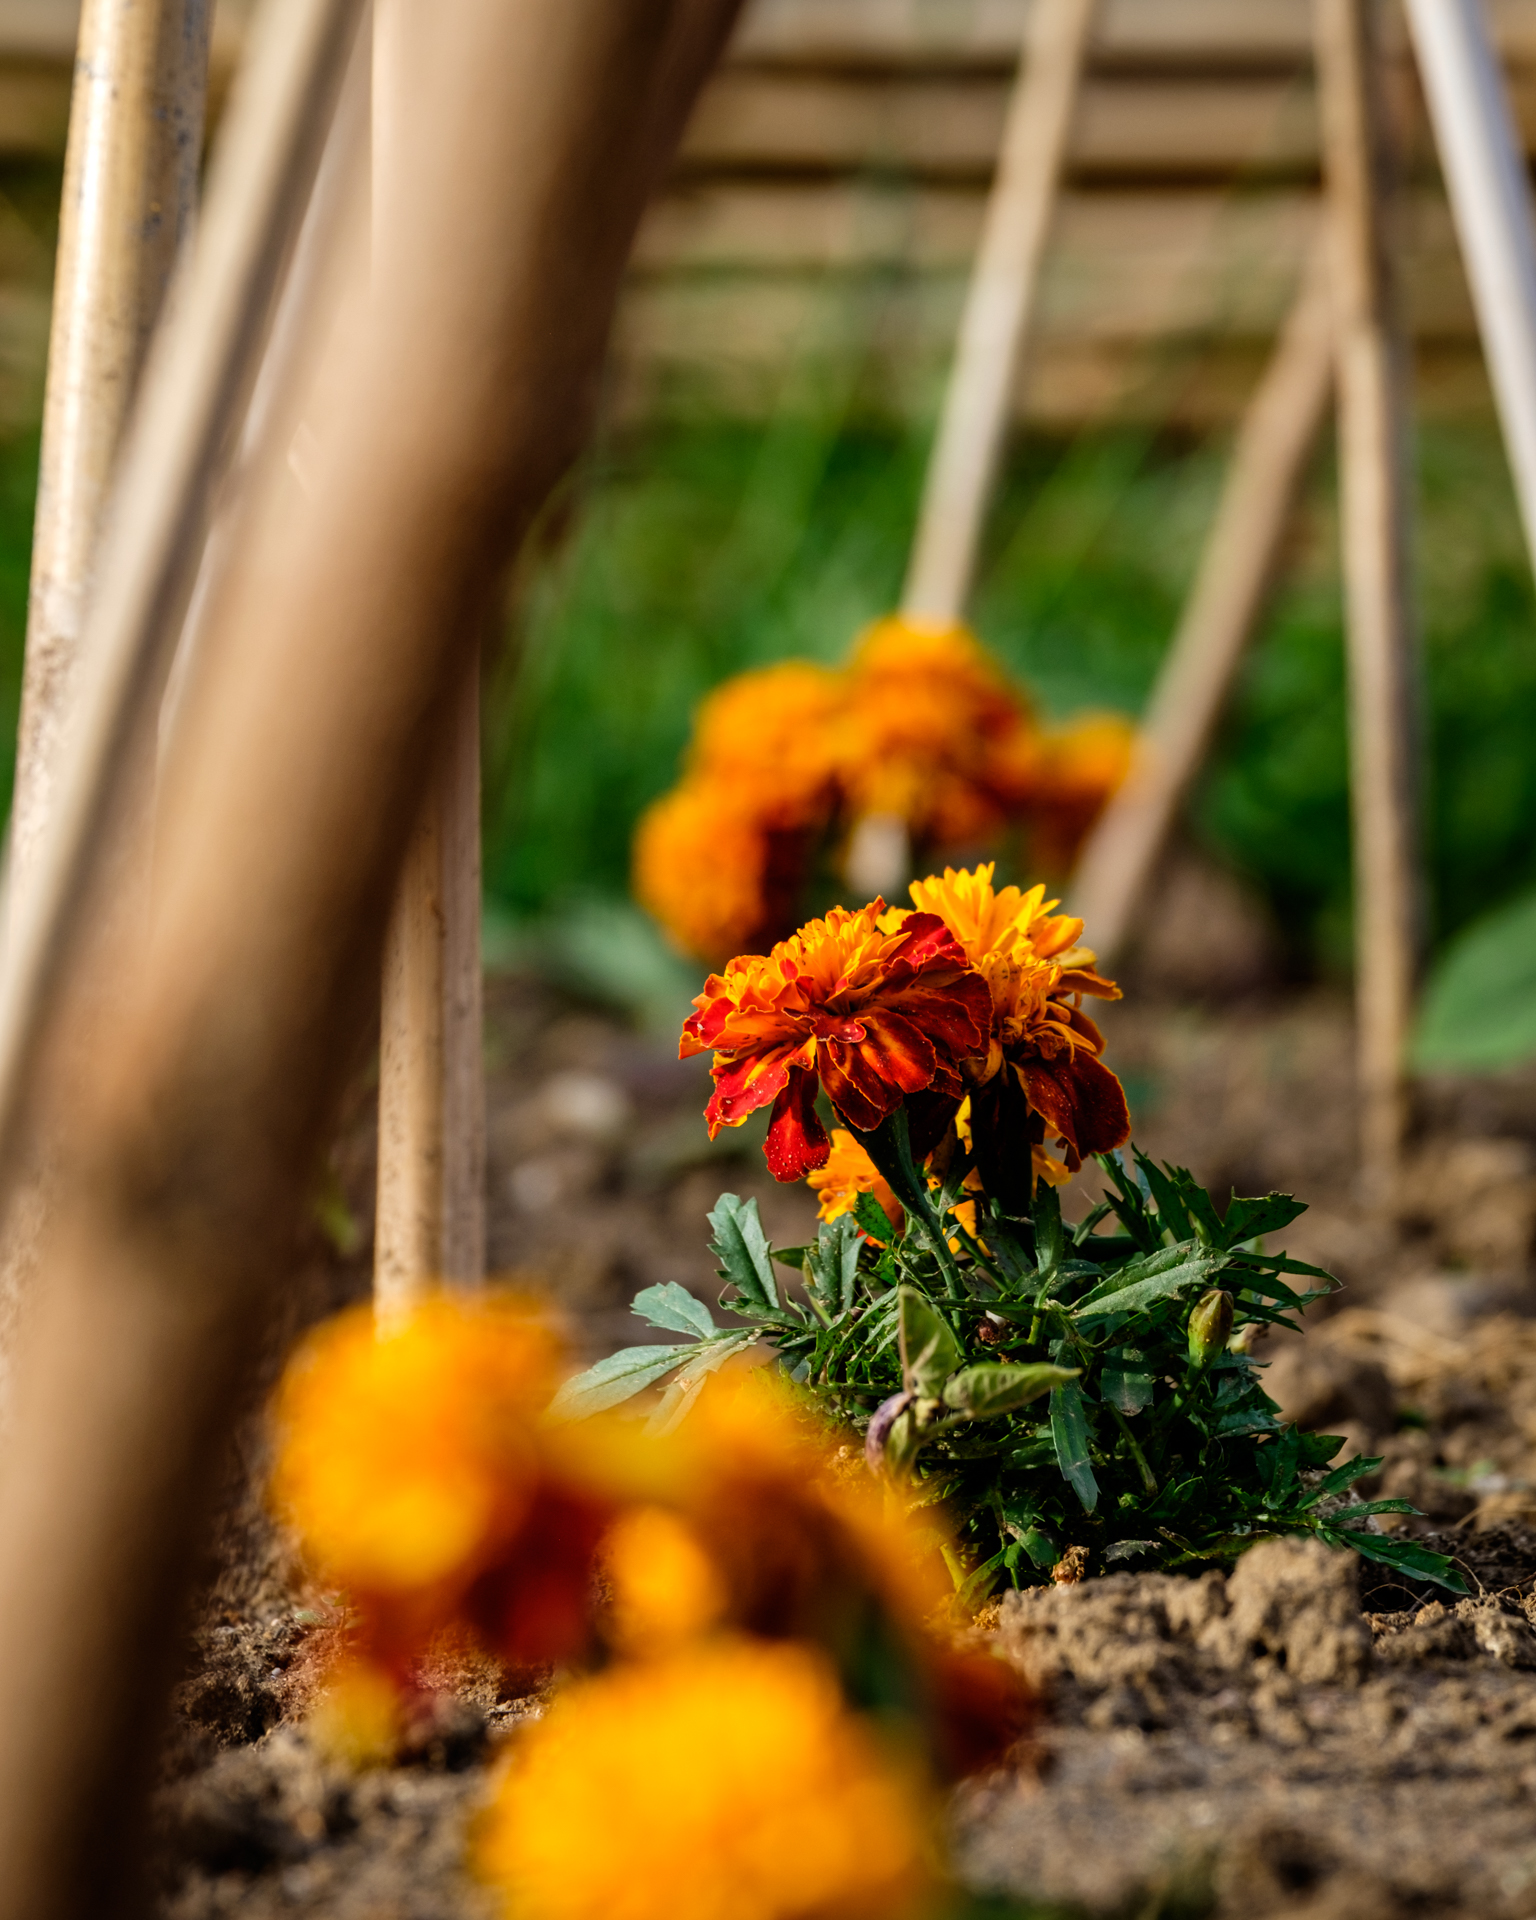 Marigolds, the garden's natural protectors